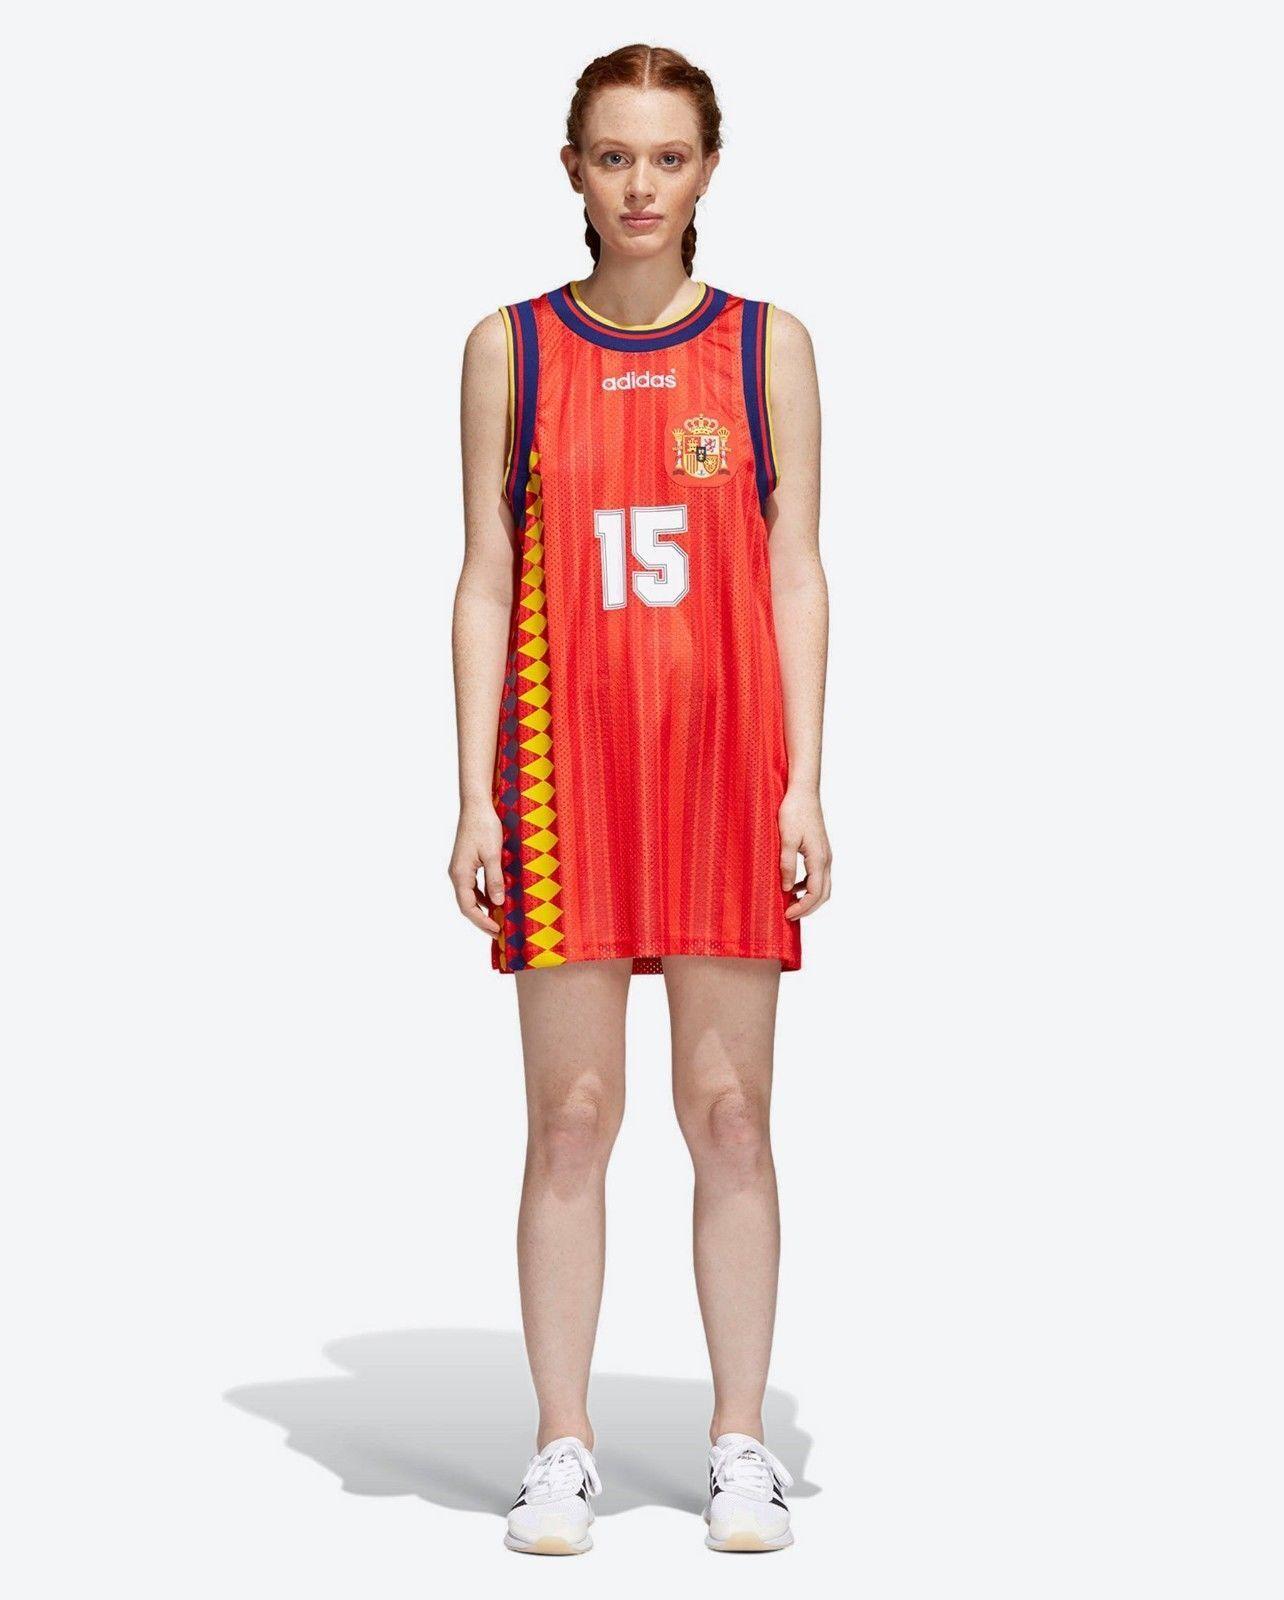 Adidas Woherren Spain Tank Top-Dress World Cup Football Sergio Ramos-CE2311 SMALL